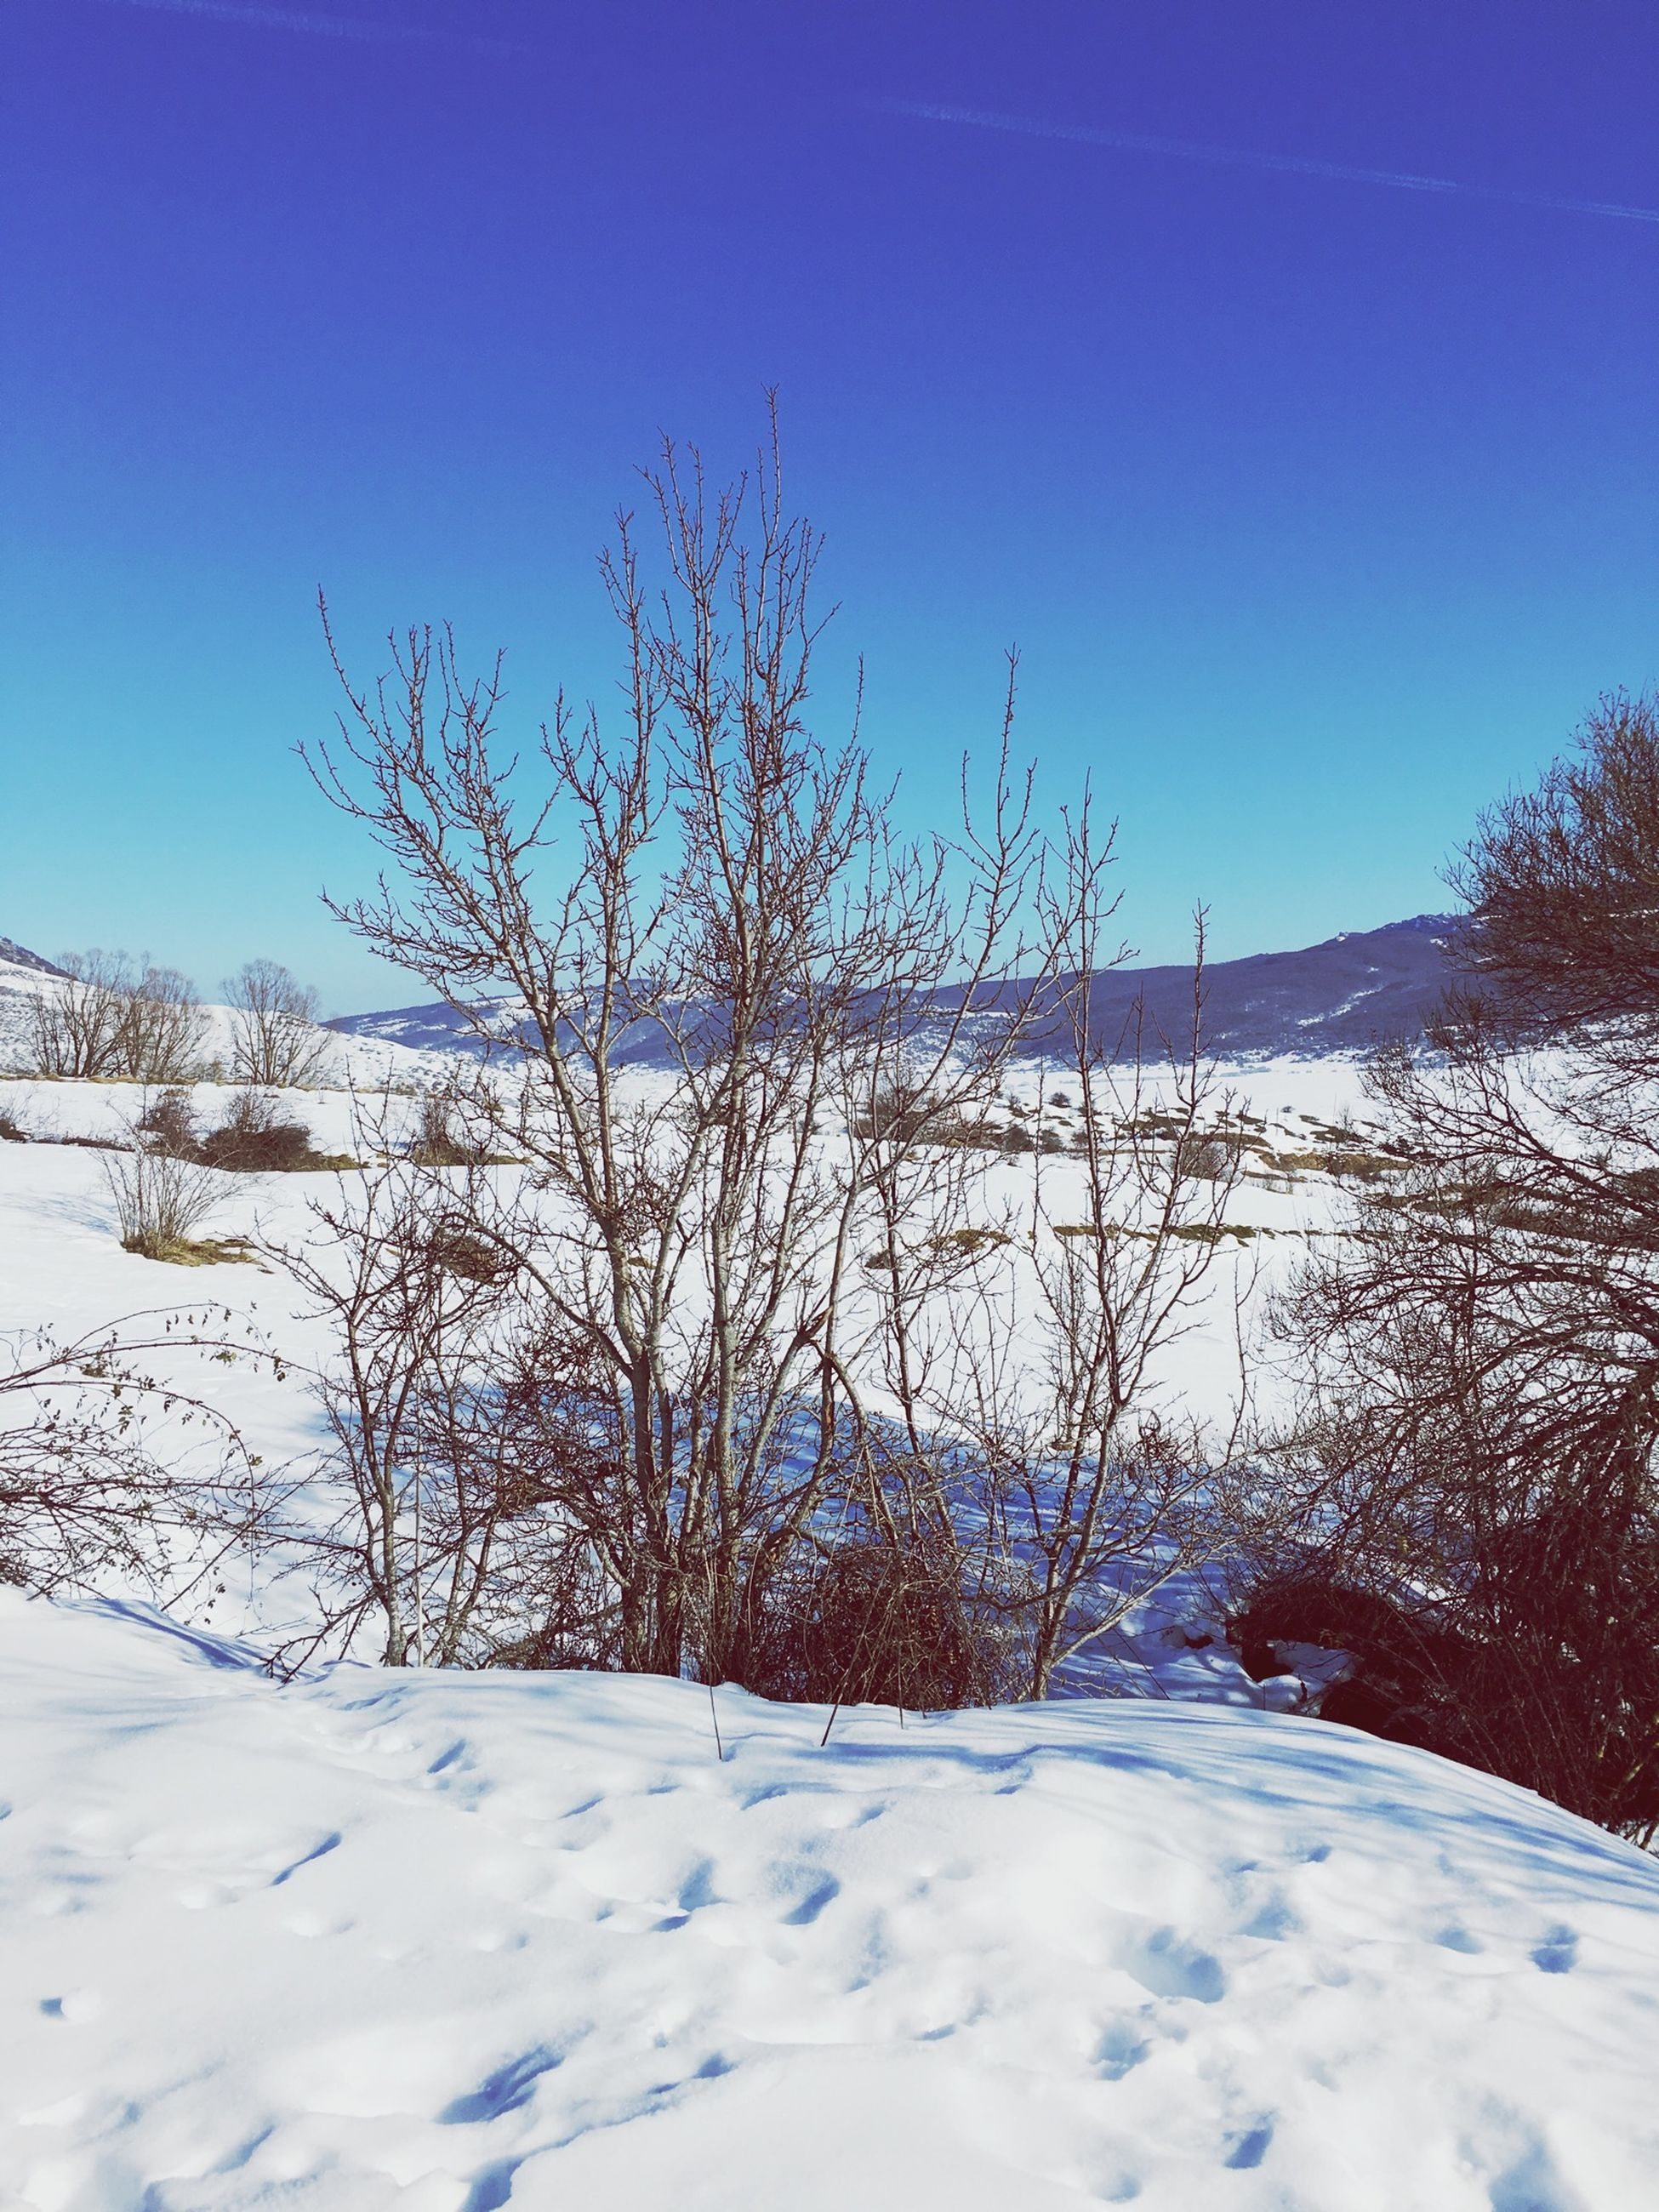 snow, cold temperature, winter, clear sky, blue, bare tree, tranquility, tranquil scene, copy space, nature, season, frozen, beauty in nature, scenics, landscape, field, covering, snow covered, tree, non-urban scene